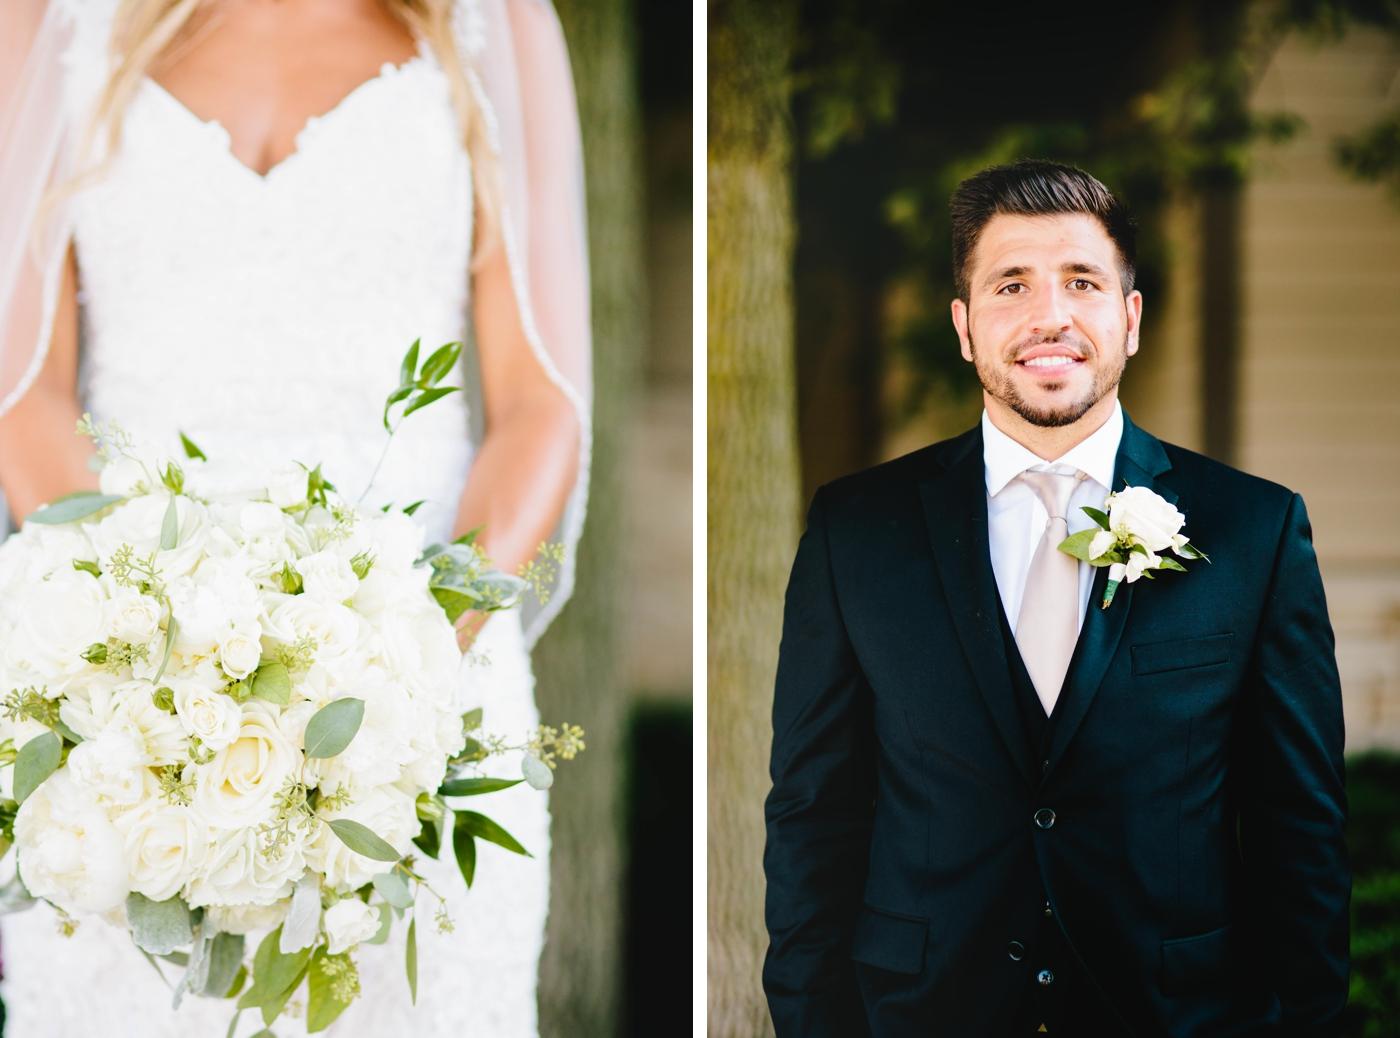 chicago-fine-art-wedding-photography-patano10